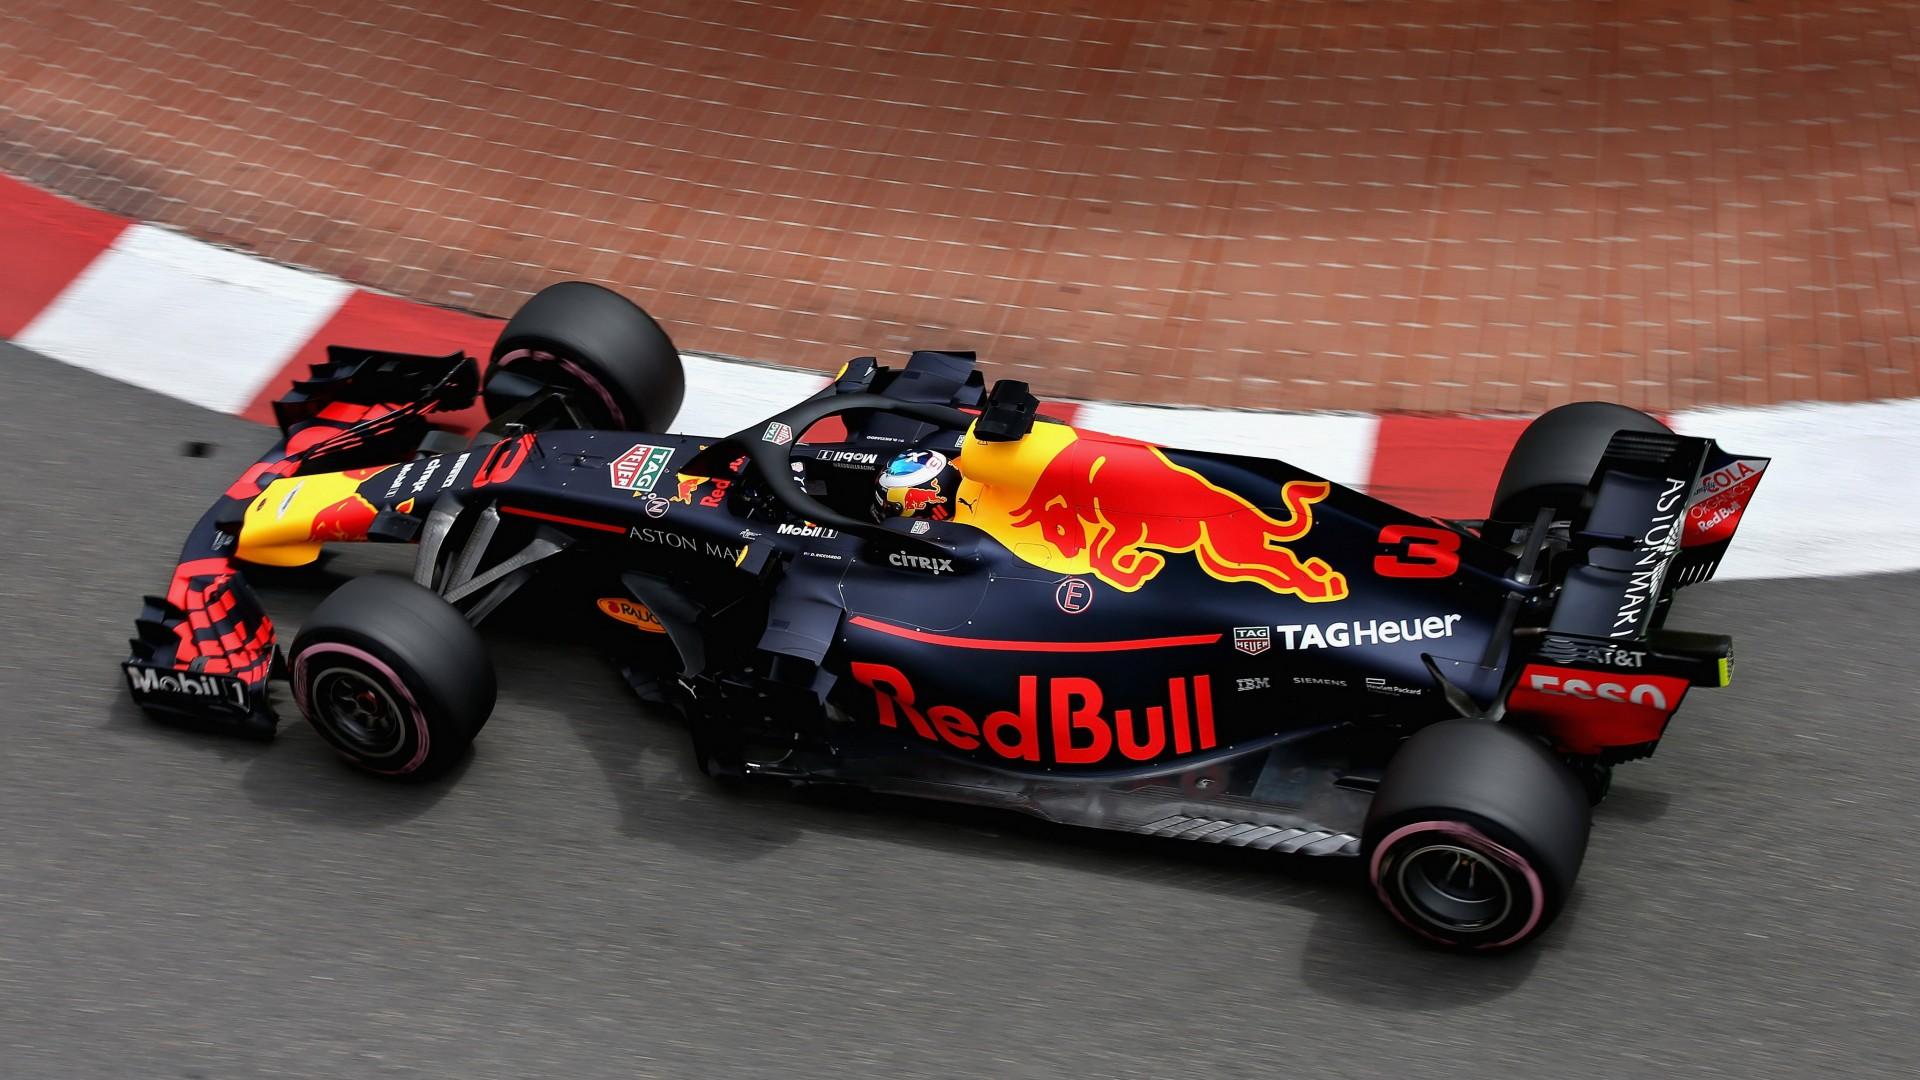 Mclaren F1 Iphone Wallpaper Red Bull Rb14 2018 4k 2 Wallpaper Hd Car Wallpapers Id